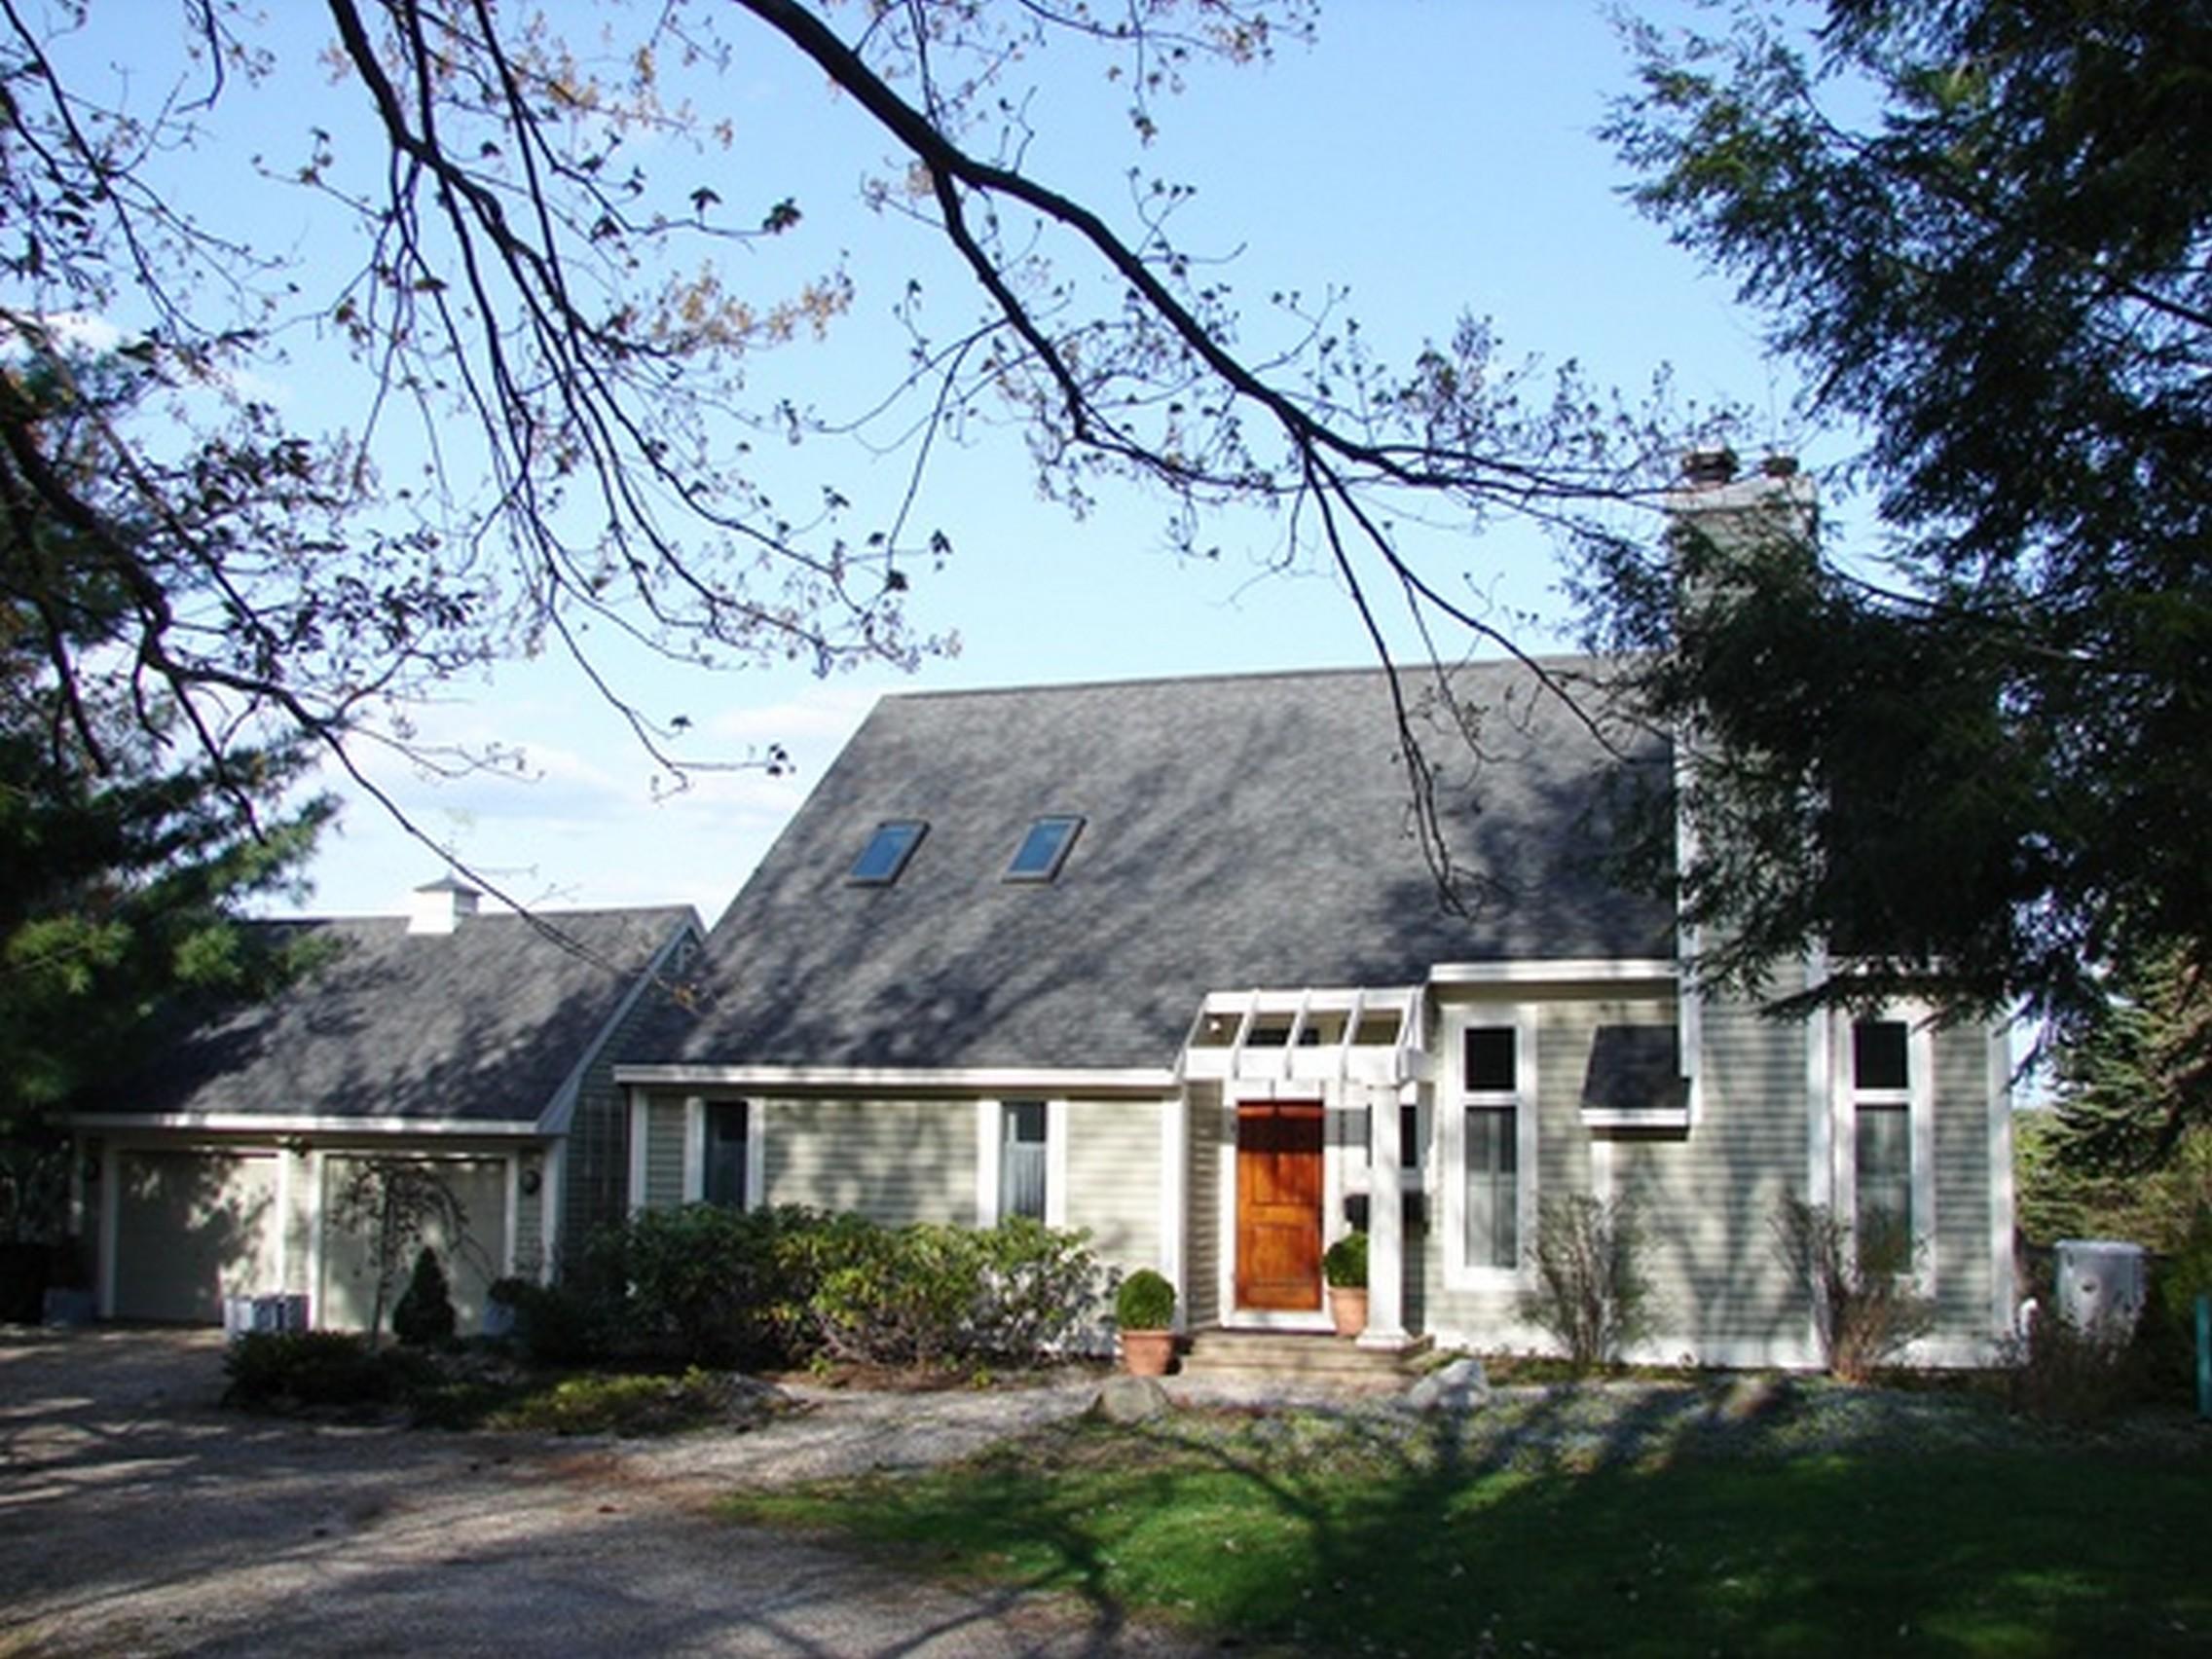 Villa per Vendita alle ore Milton Road Gem 363 Milton Rd Goshen, Connecticut, 06756 Stati Uniti